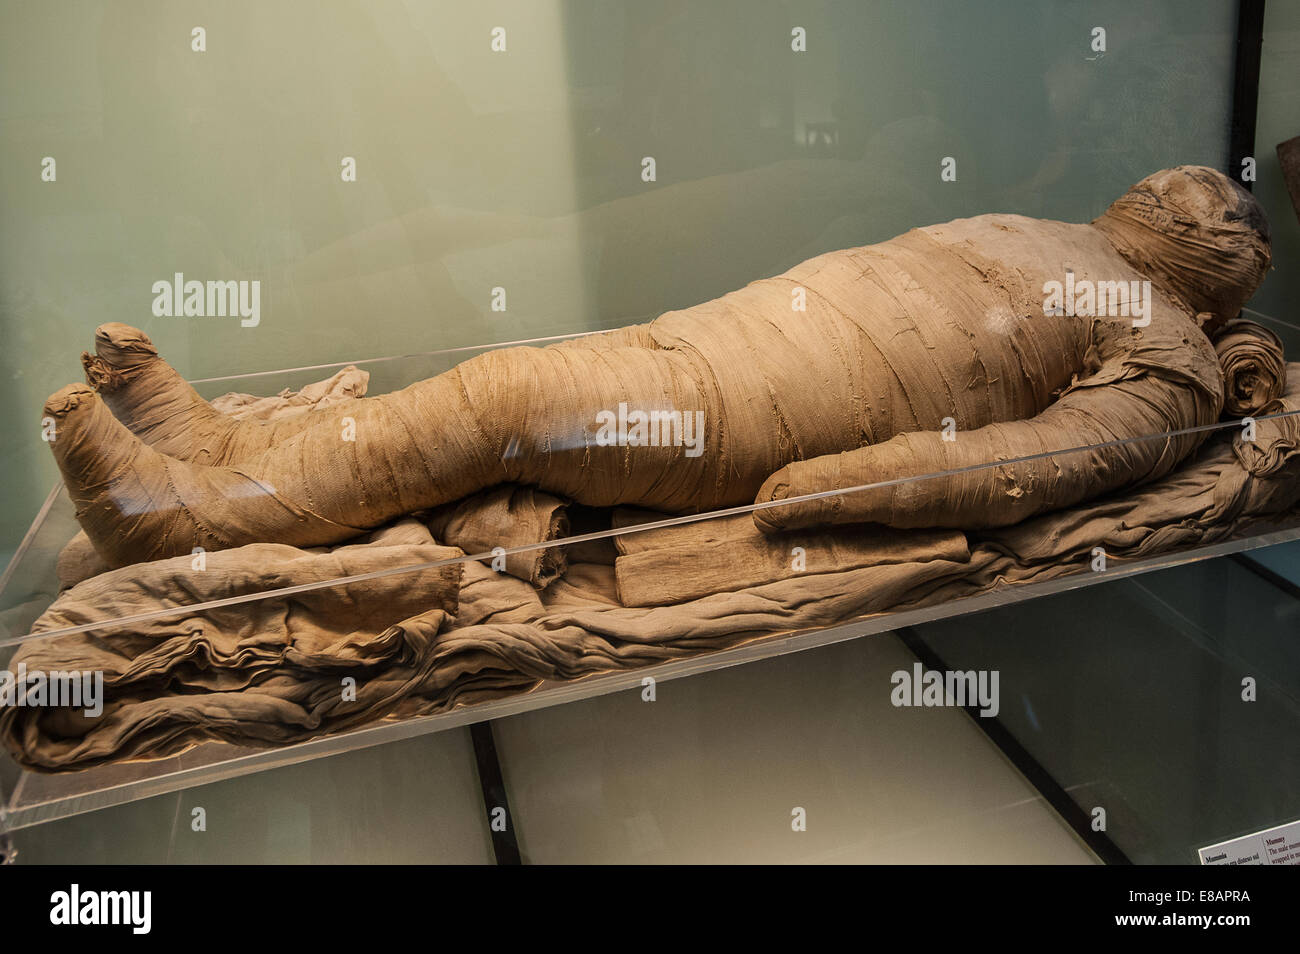 Italy Piedmont Turin Egyptian Museum Mummy - Stock Image